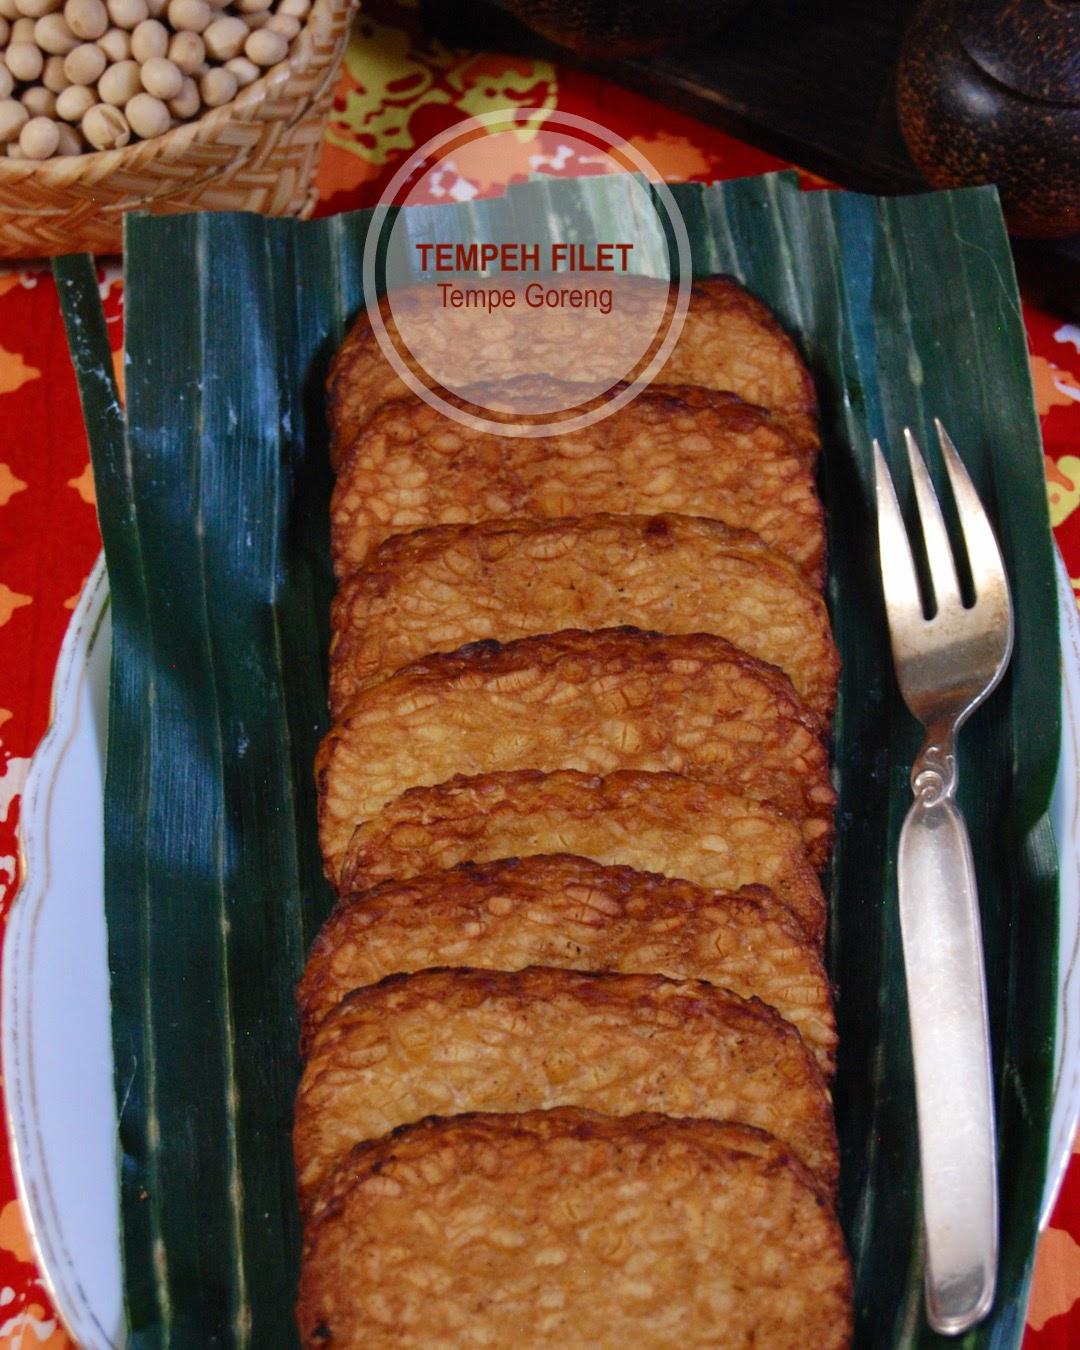 Rezept Tempehfilet, nämlich Tempe Goreng aus Indonesien